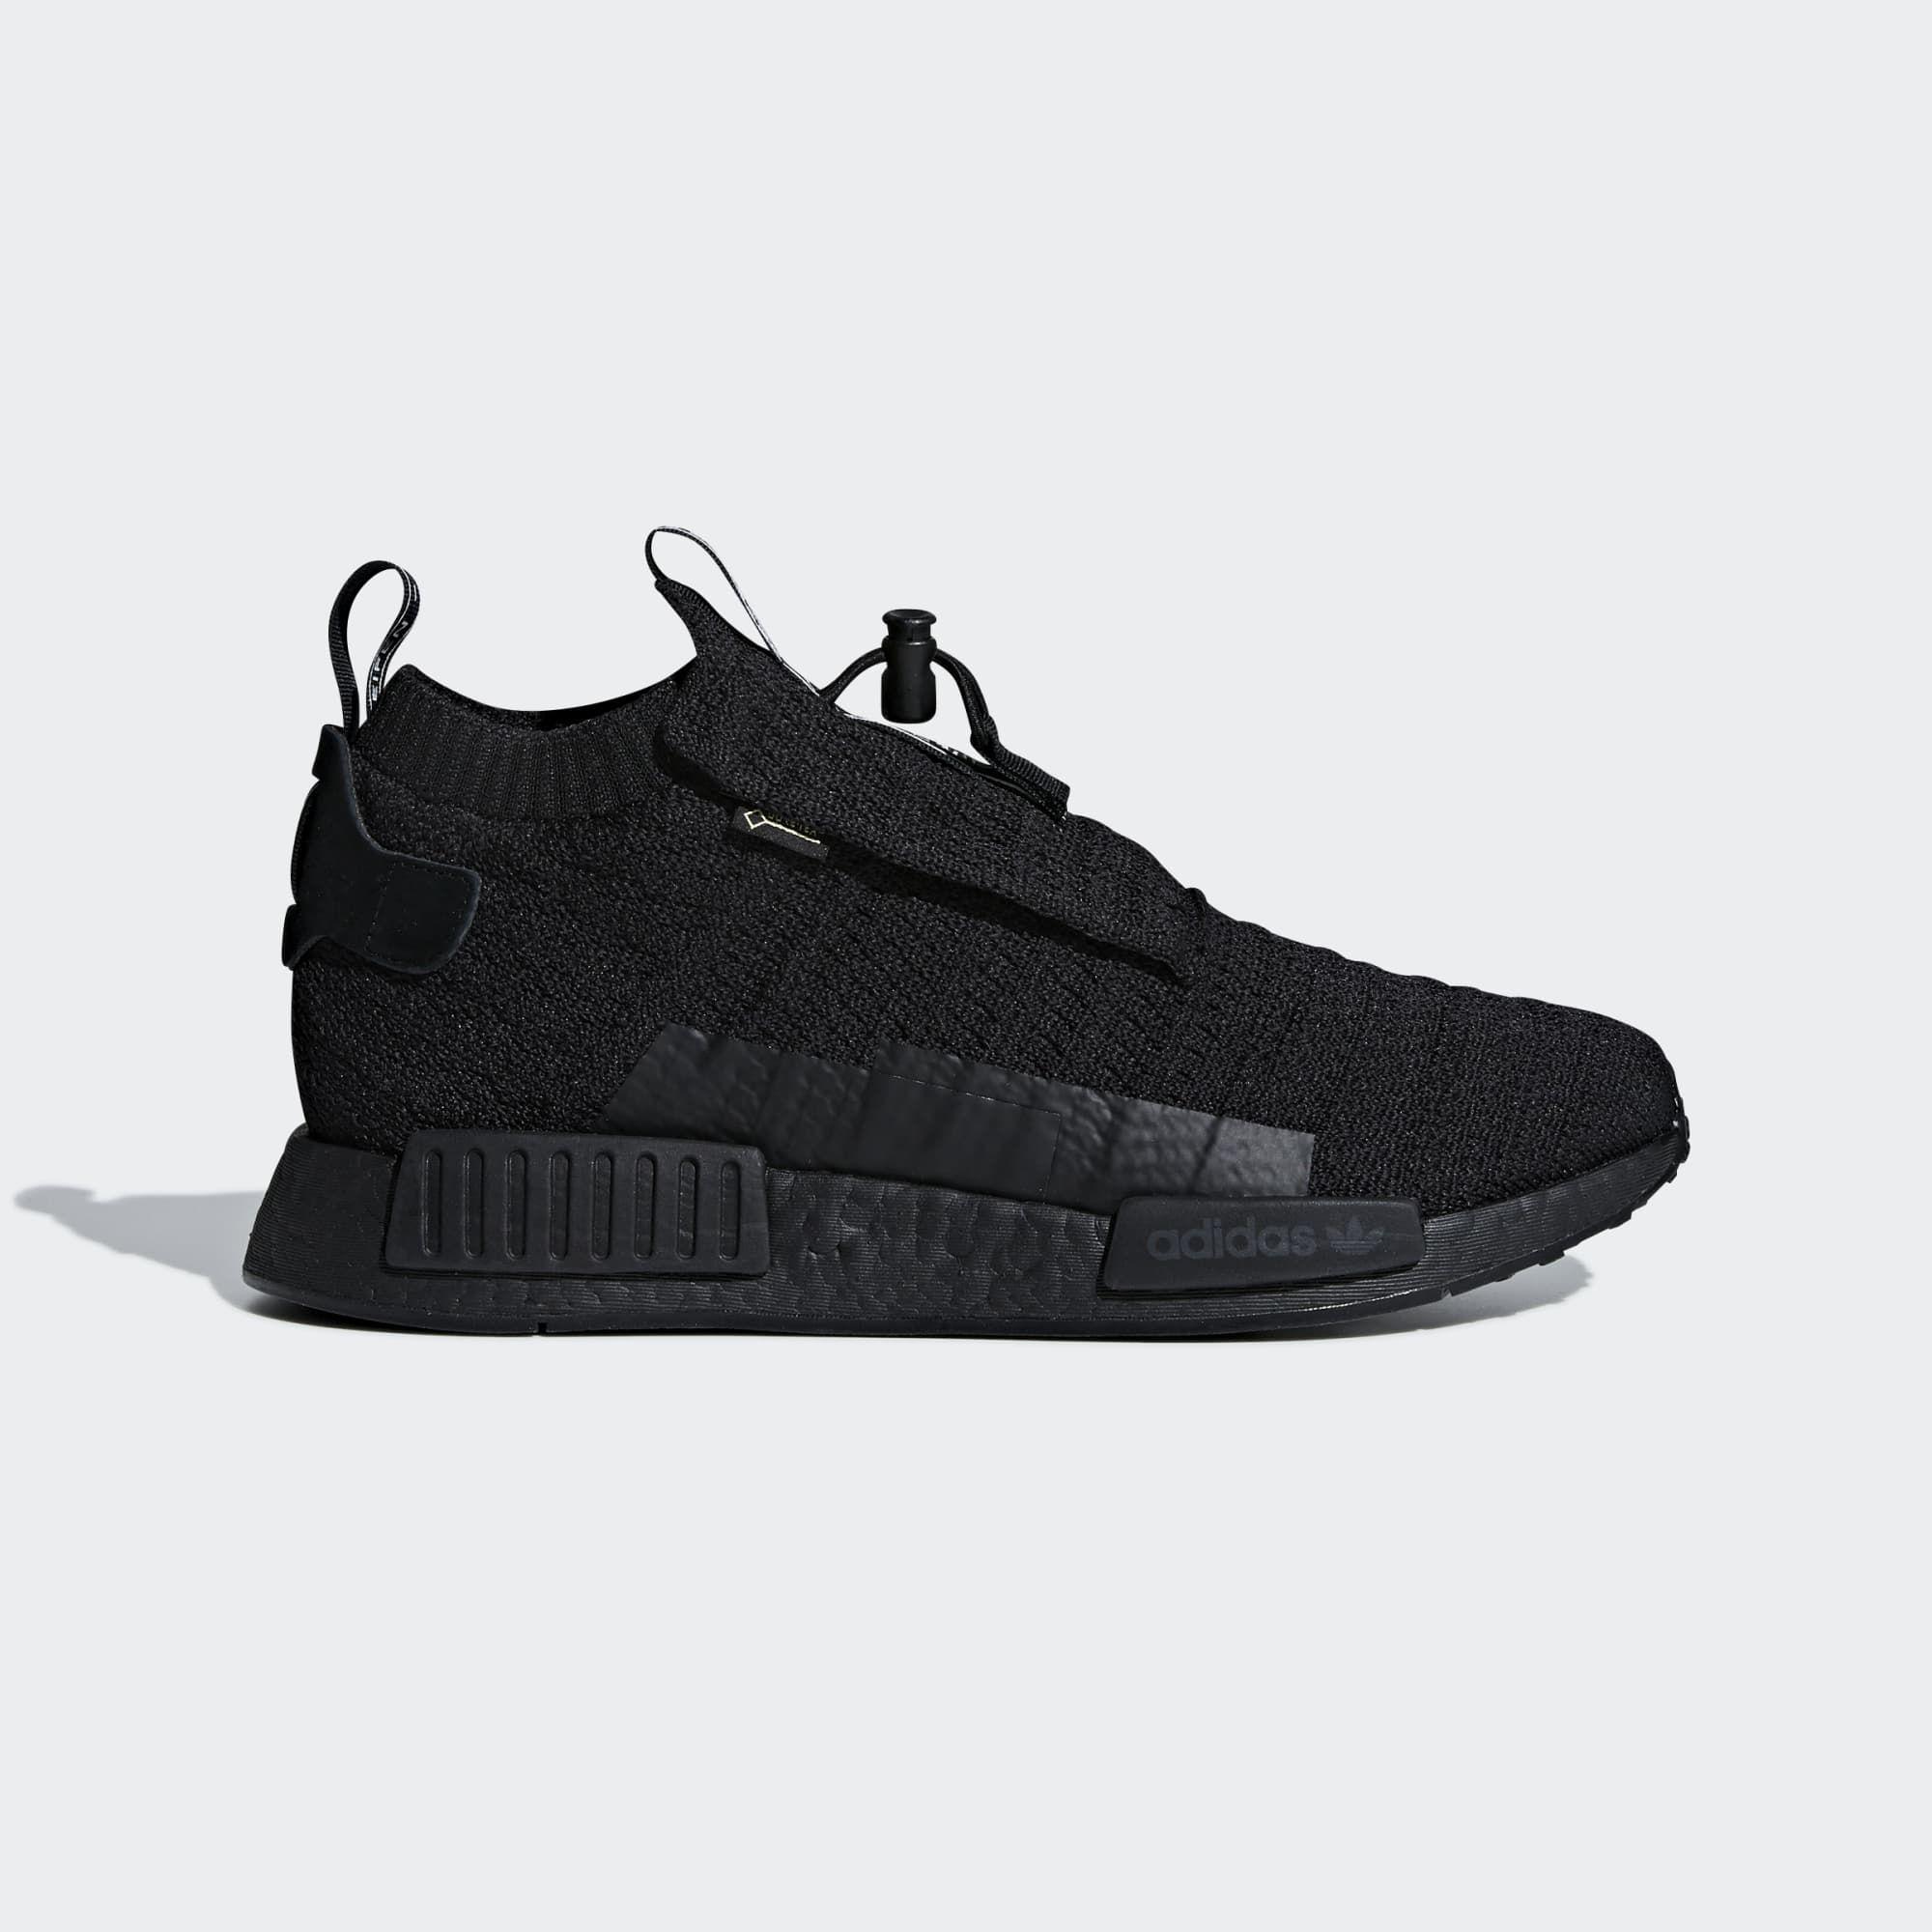 0da026df36324 adidas NMD TS1 Primeknit GTX Shoes - Black